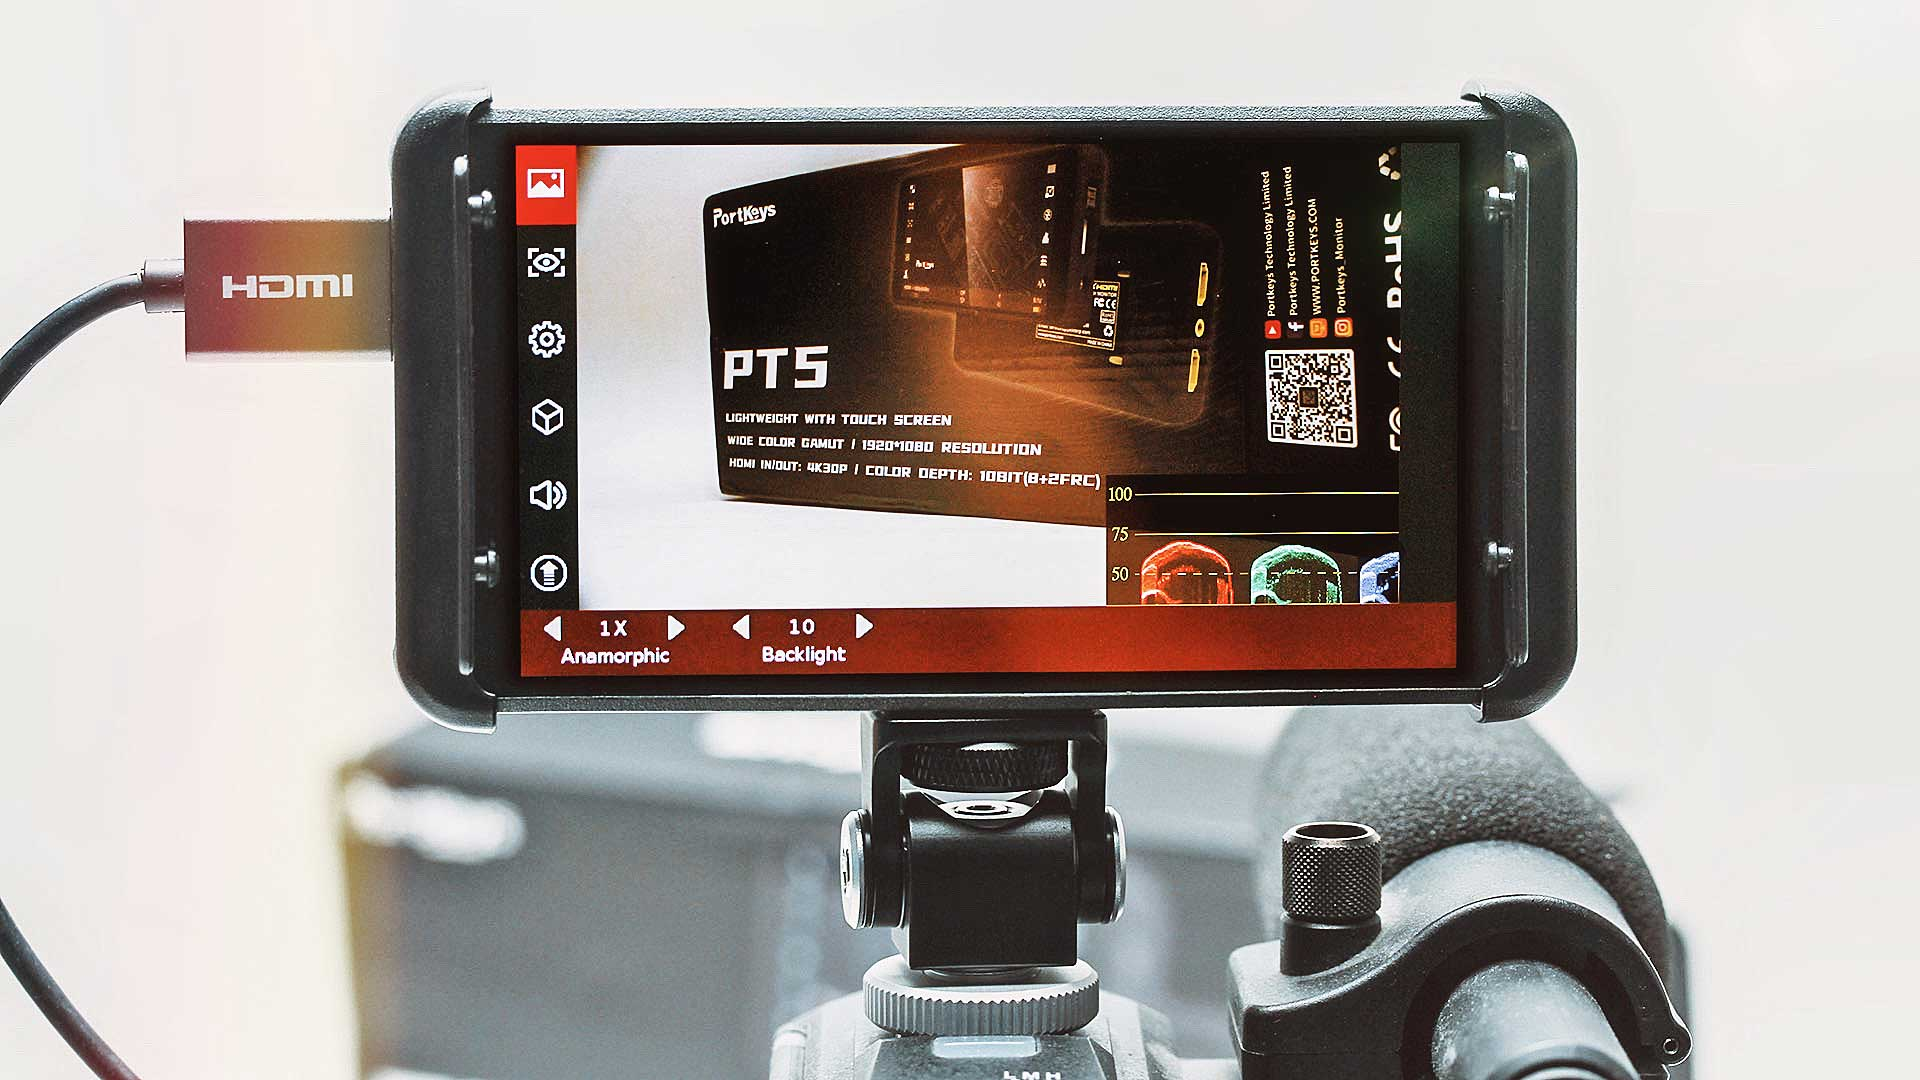 The Portkeys PT5 monitor. Image: Phil Rhodes.